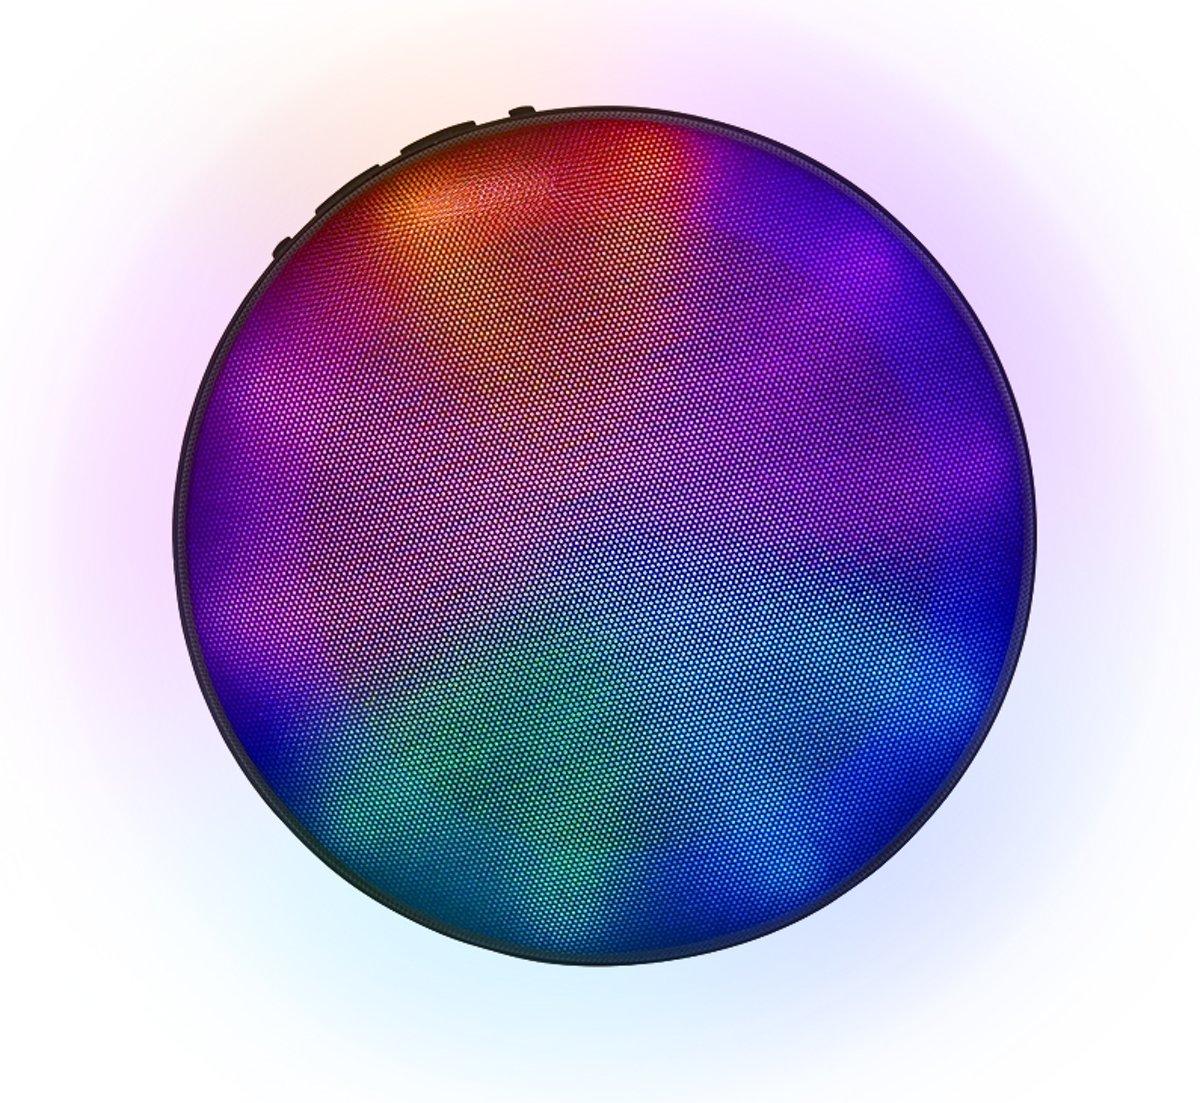 ION Helios Bluetooth Speaker - Stereogeluid met RGB LED Moodlight - 6W Krachtige Speaker kopen